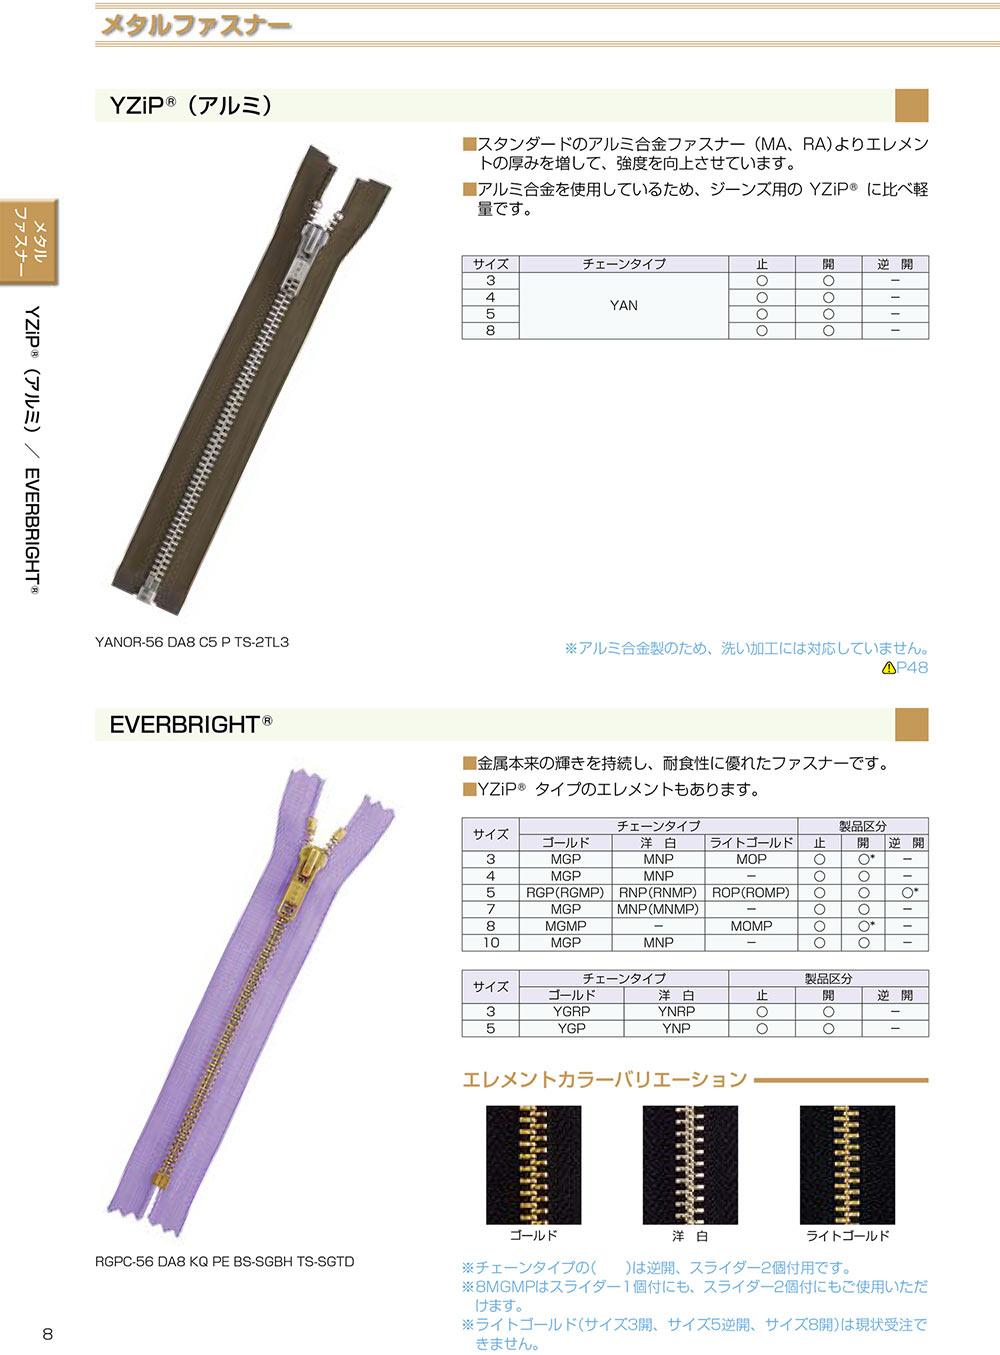 5YANC YKK YZIPワイジップ(アルミ)5サイズ クローズ[ファスナー] YKK/オークラ商事 - ApparelX アパレル資材卸通販